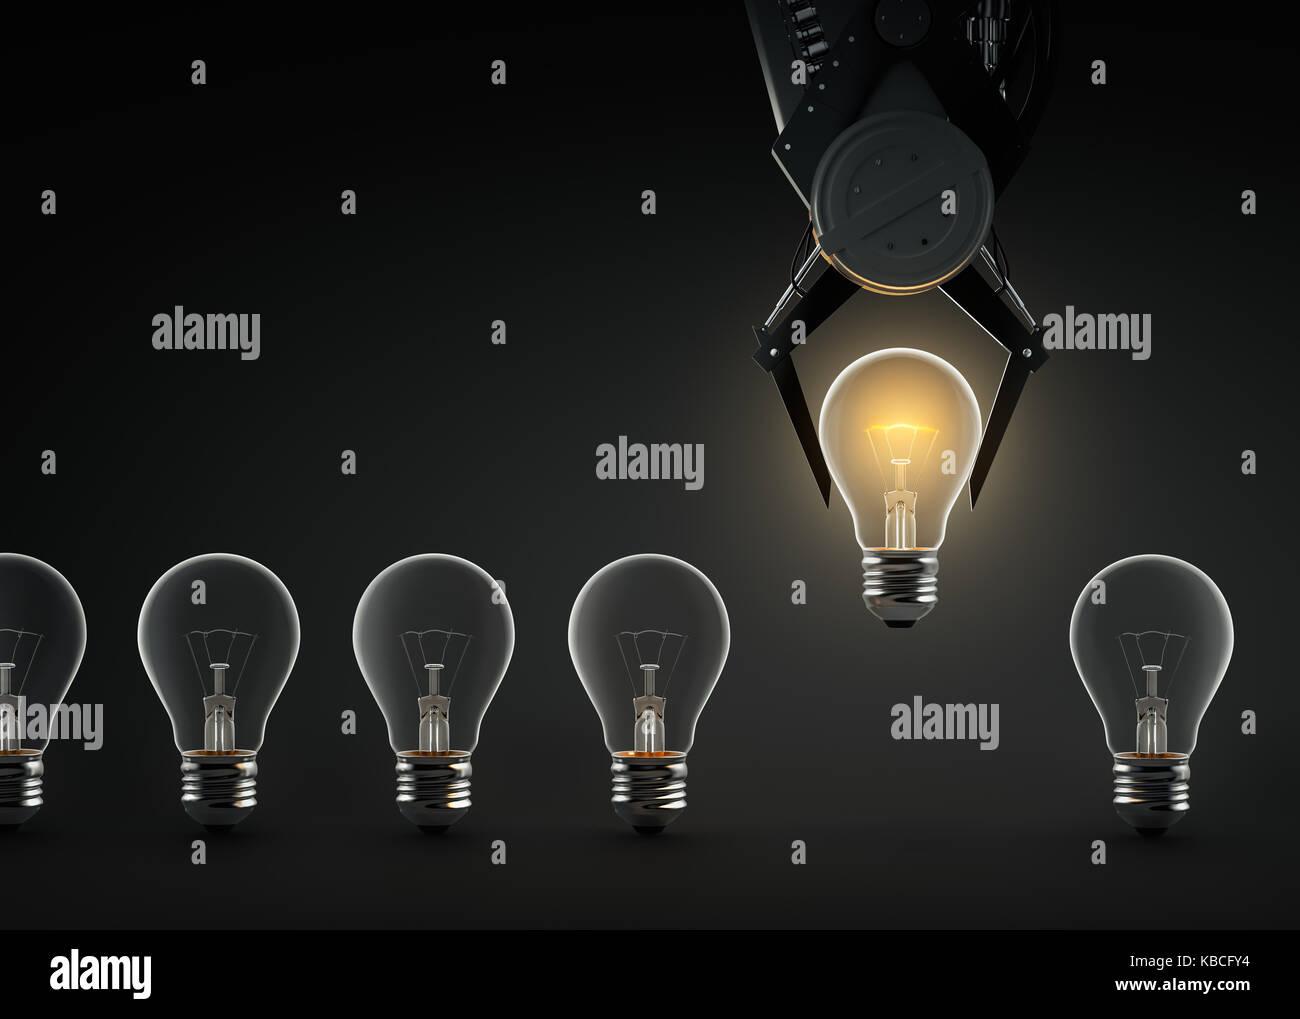 Claw machine lifting glowing light bulb - Stock Image